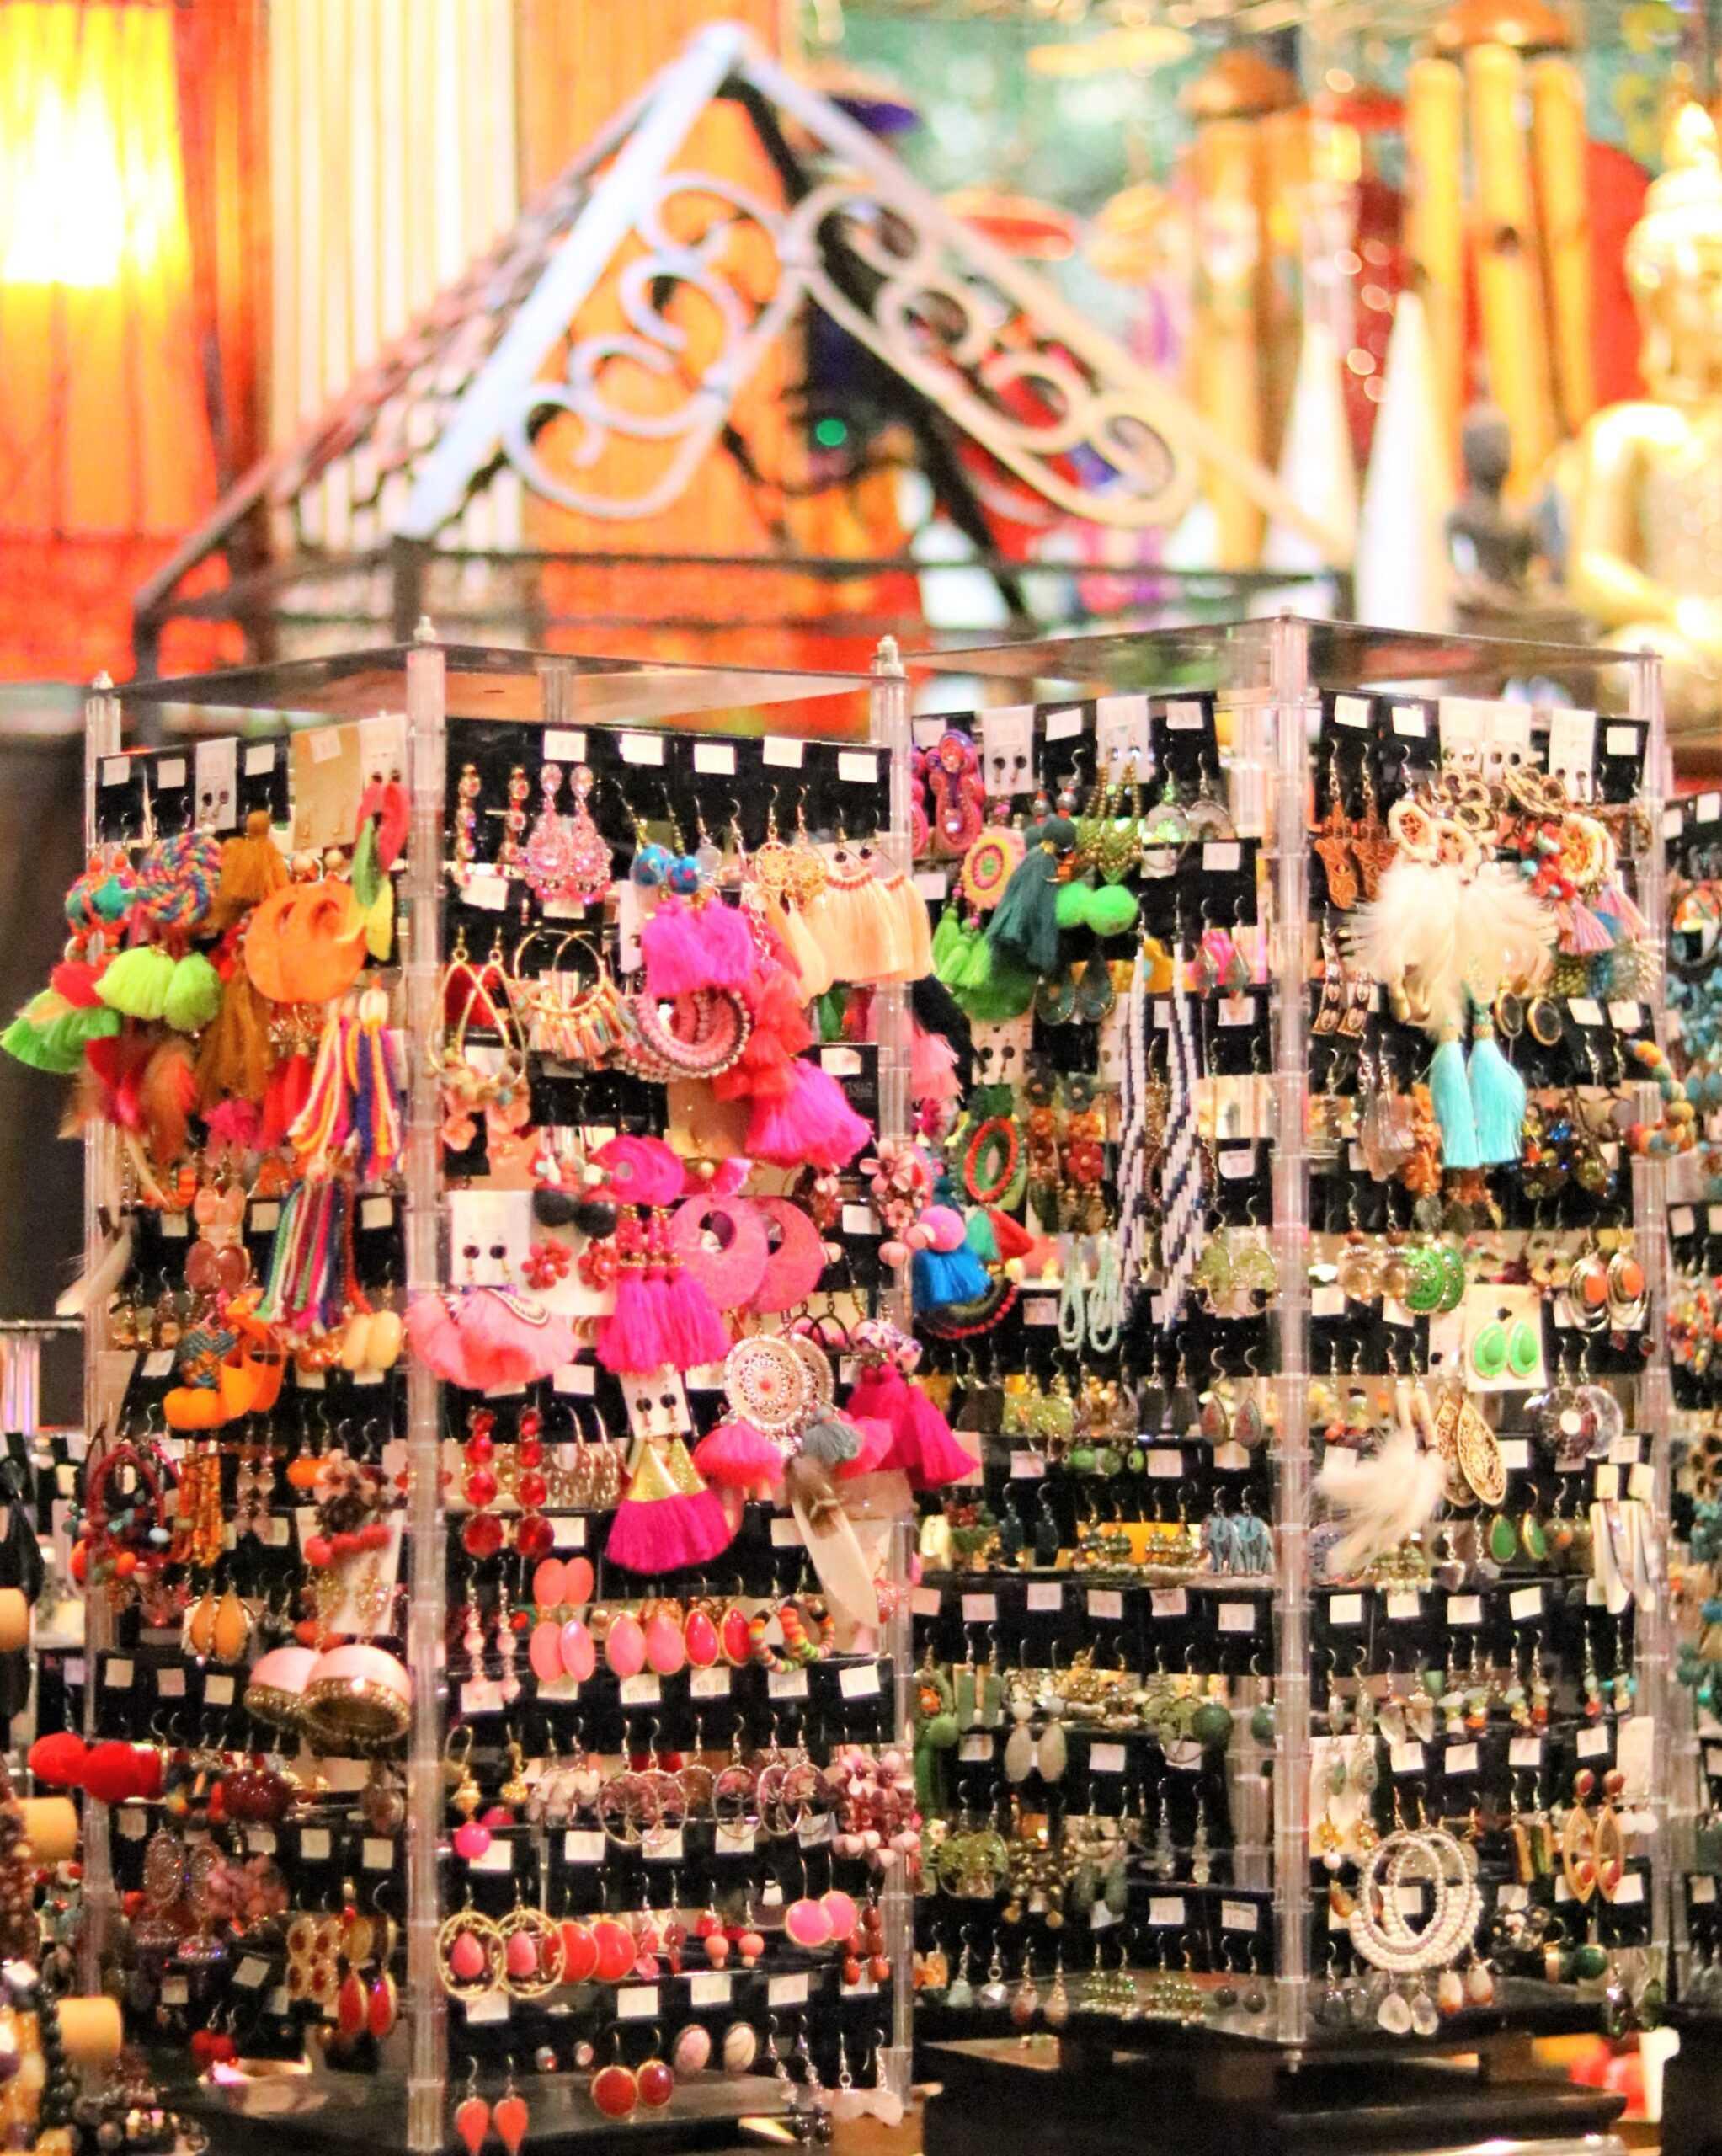 Earrings Section Inside the Shop